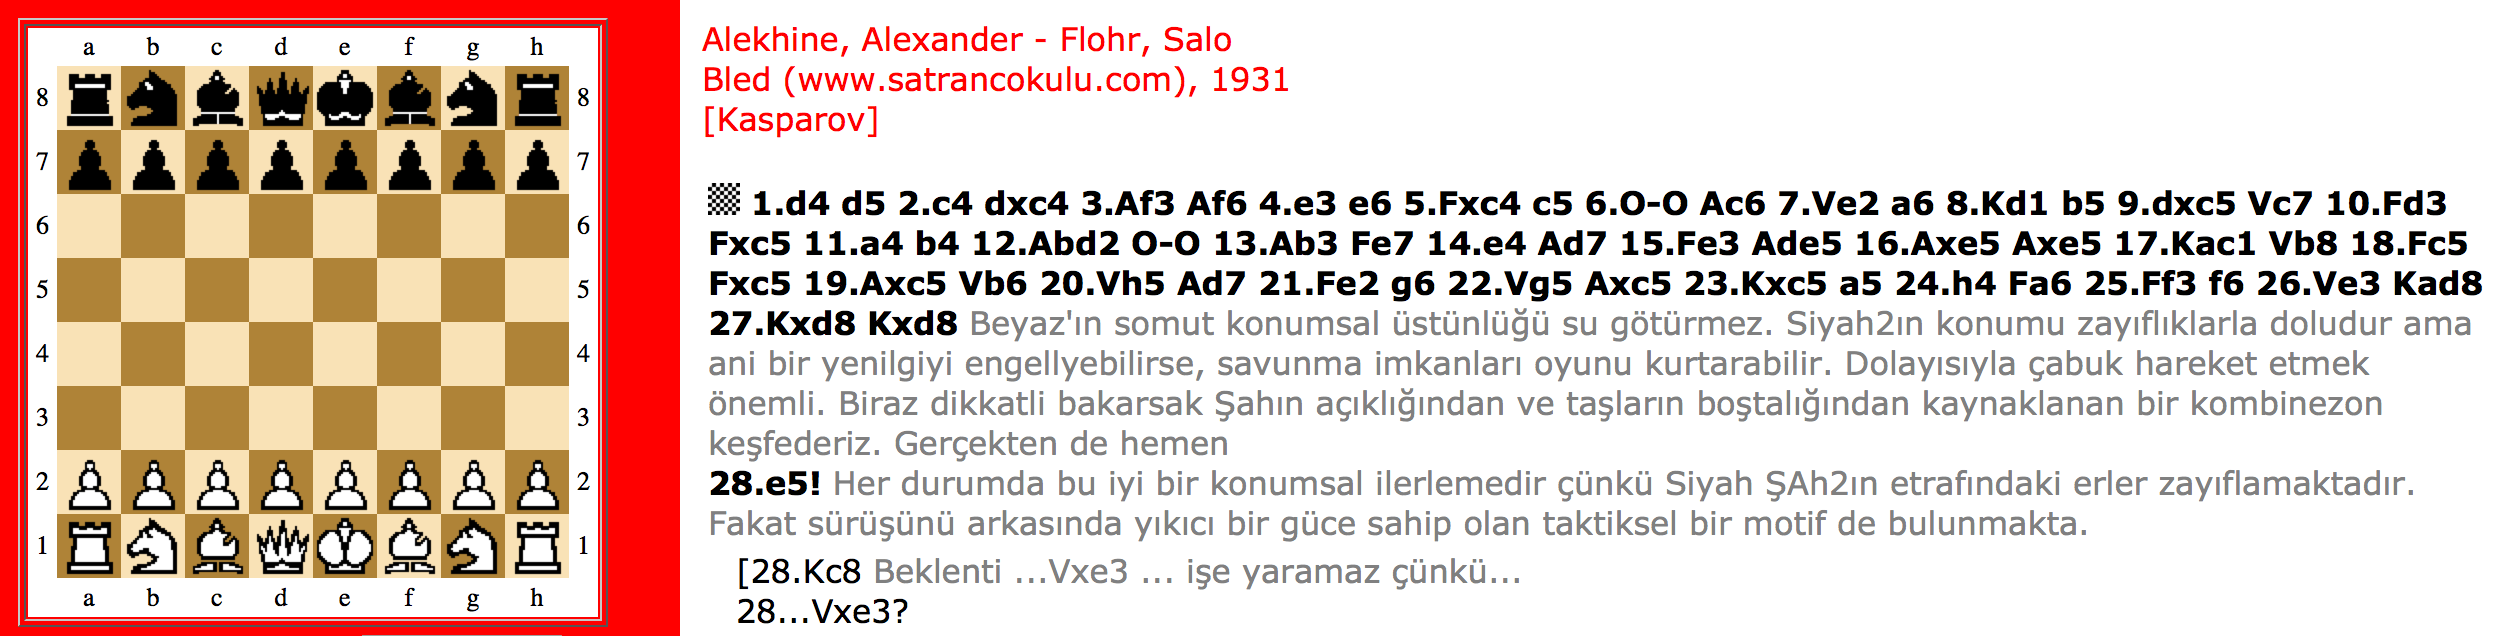 Alekhine – Flohr